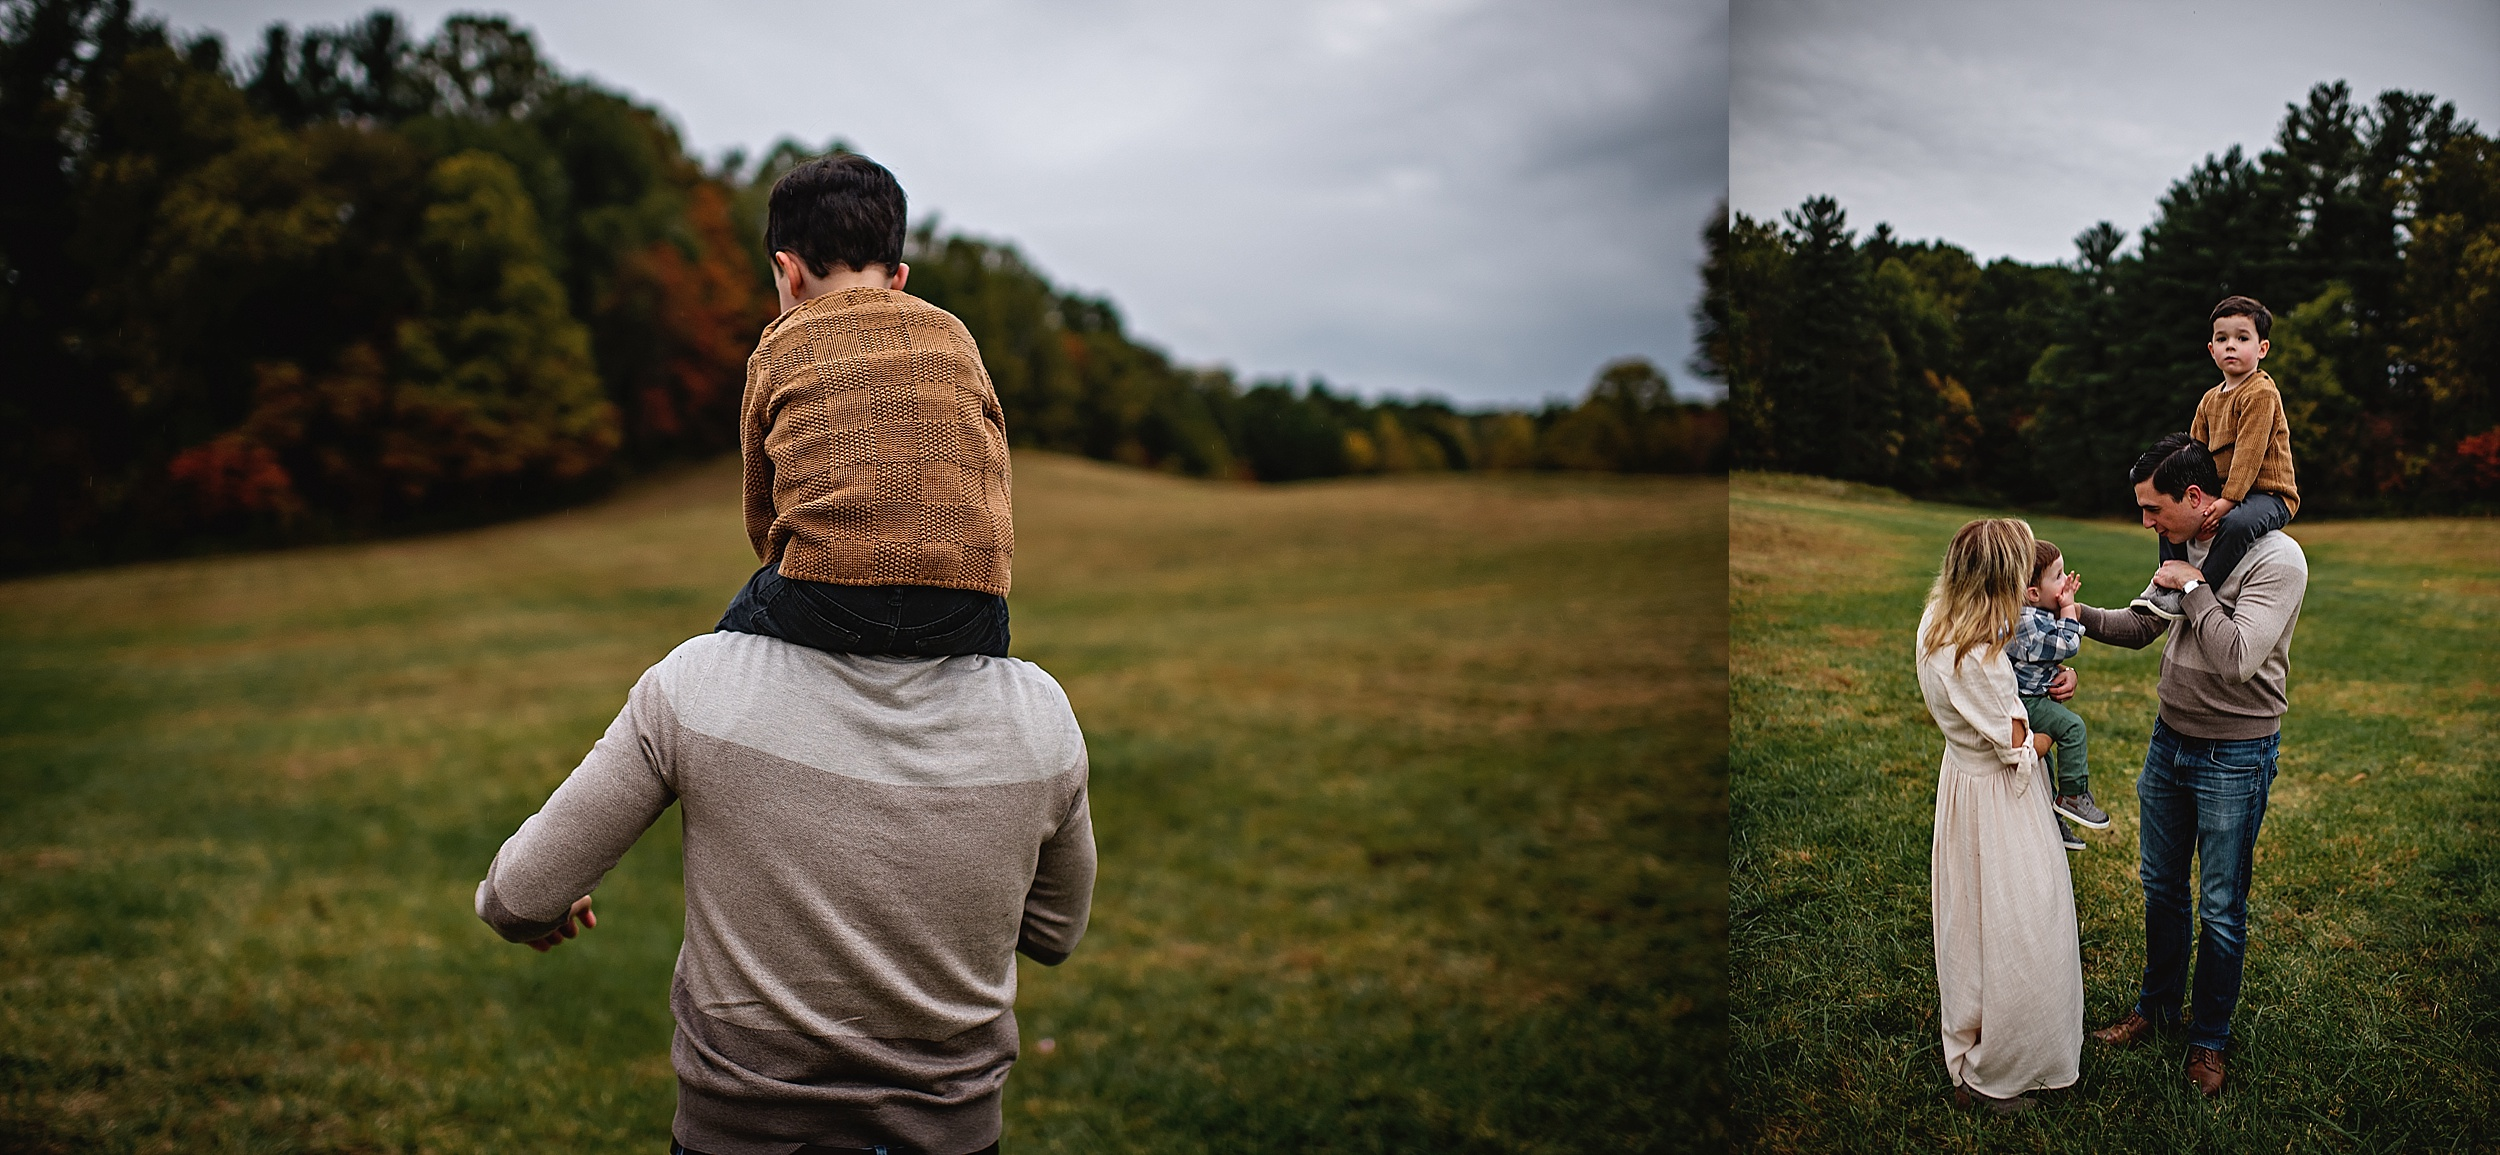 lauren-grayson-photography-portrait-artist-akron-cleveland-ohio-photographer-family-session-fields-sunset-fall_0200.jpg